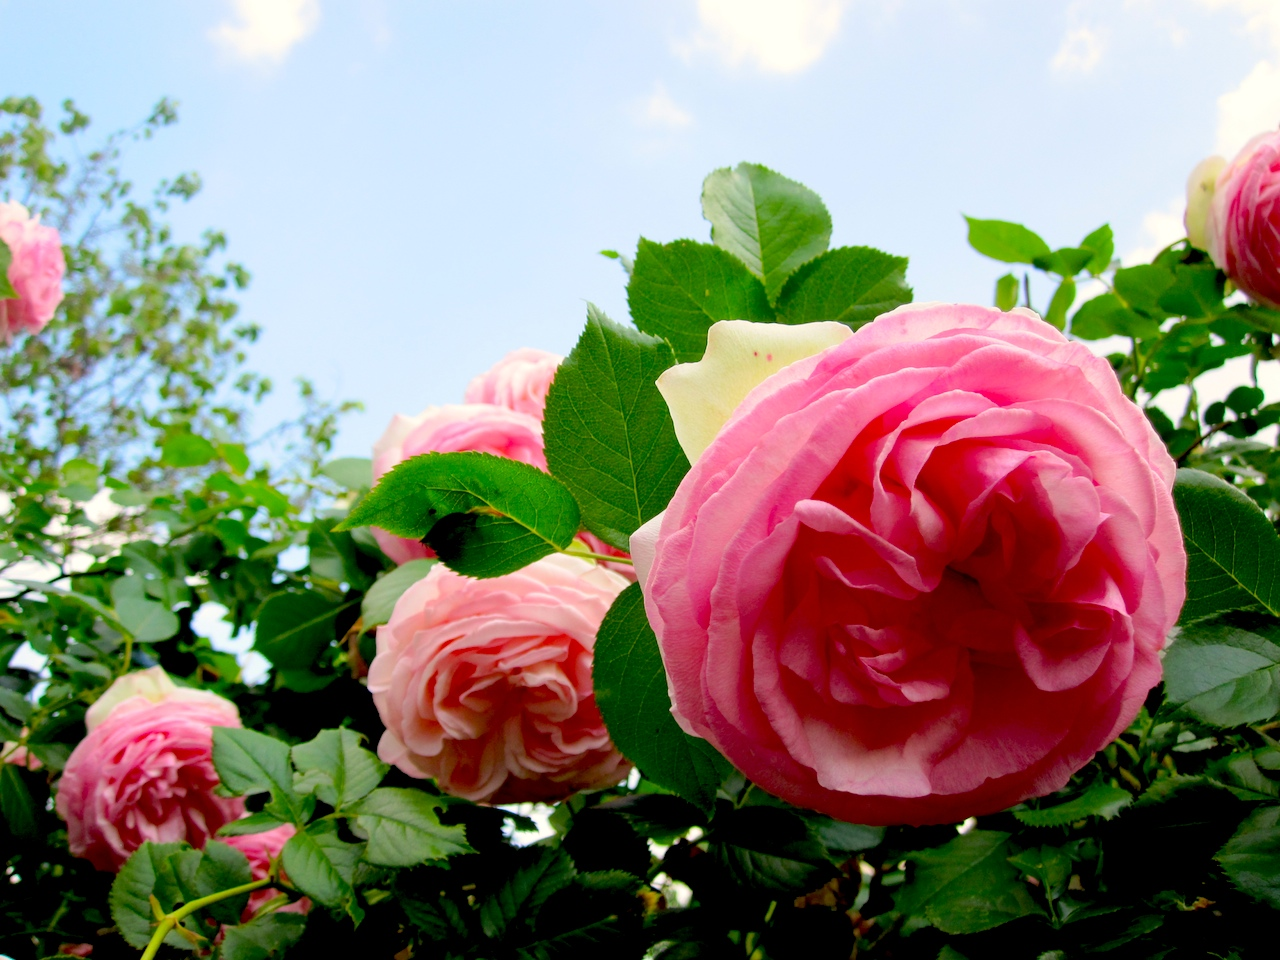 rose2010-2.jpg